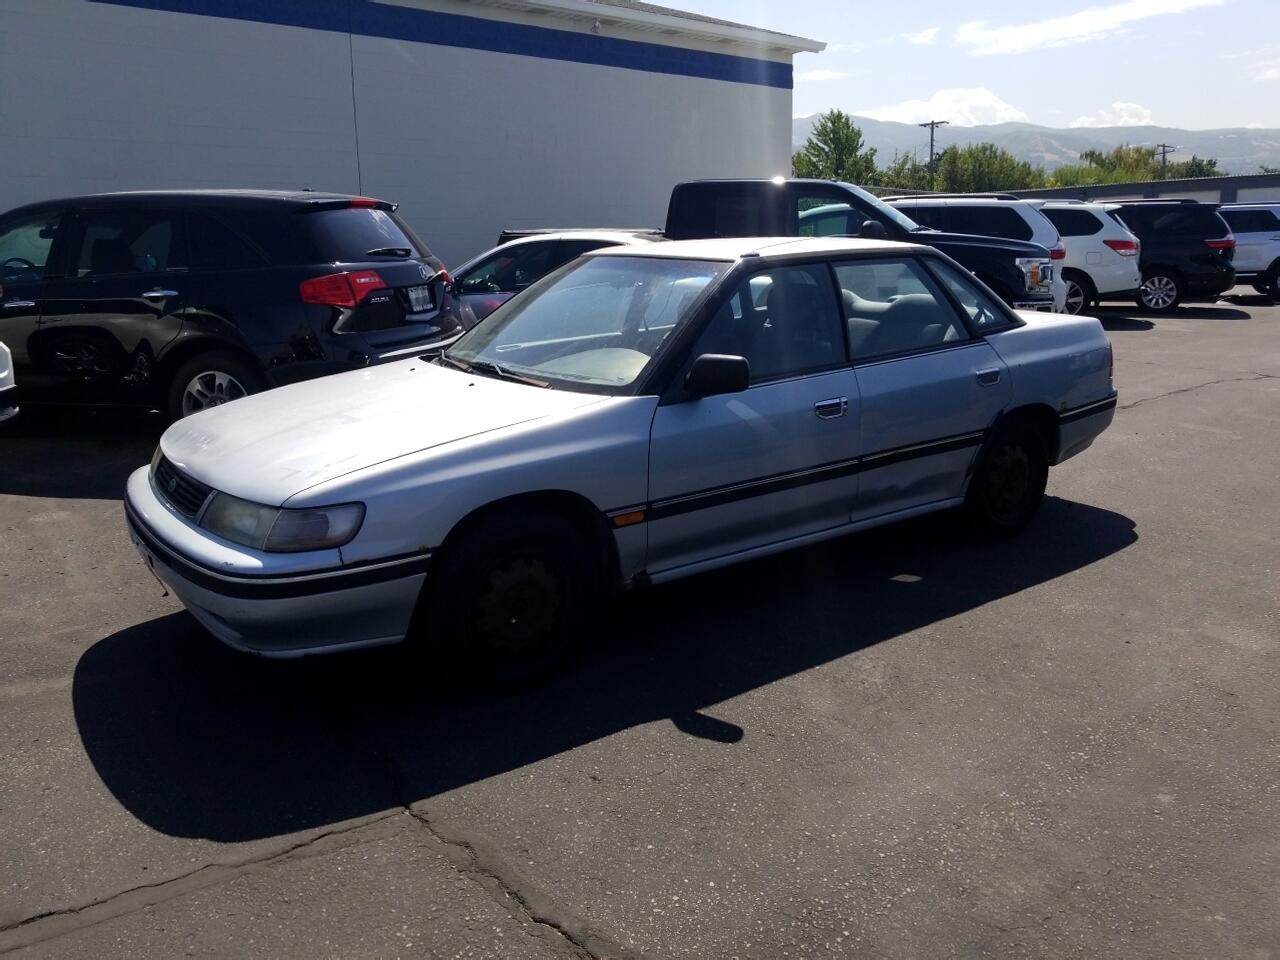 1994 Subaru Legacy Sedan 4dr Sedan 5-Spd AWD L w/HW Equipment Pkg